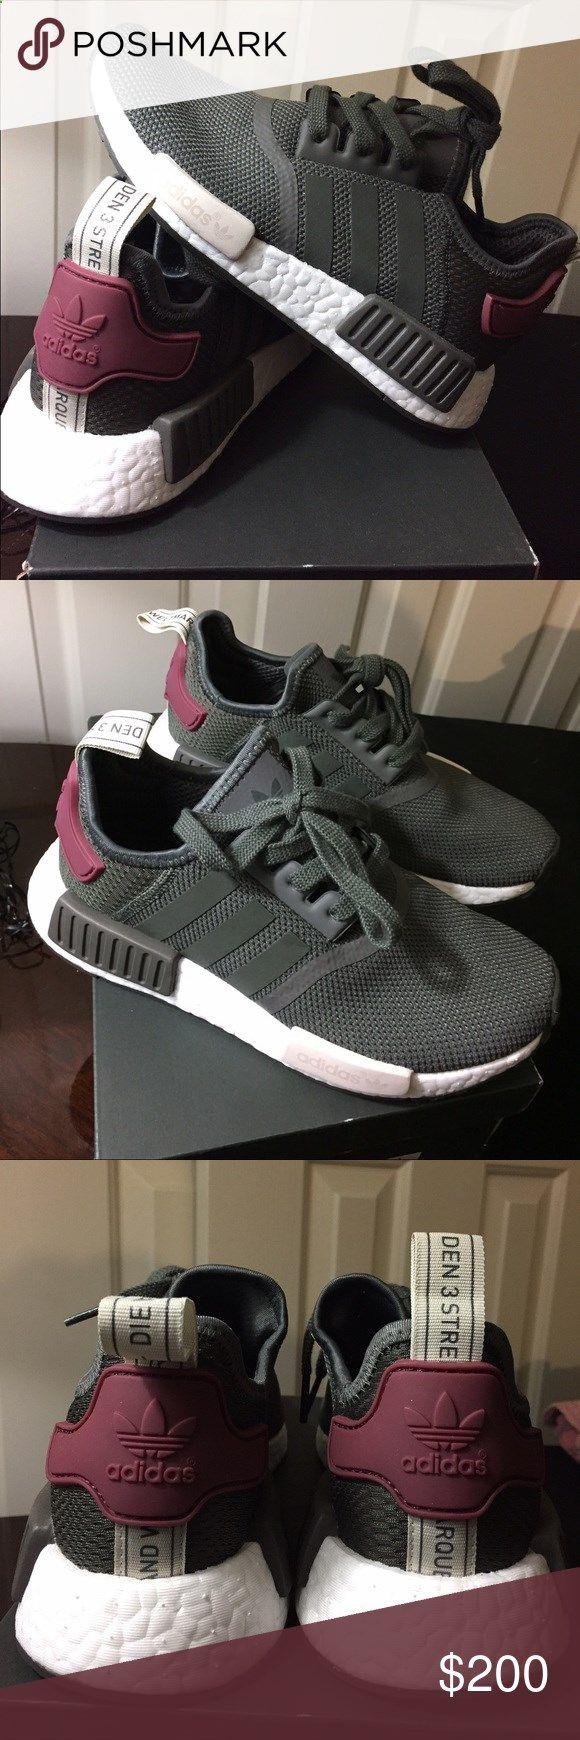 39 adidas scarpe adidas nmd r1, nmd r1 e adidas nmd